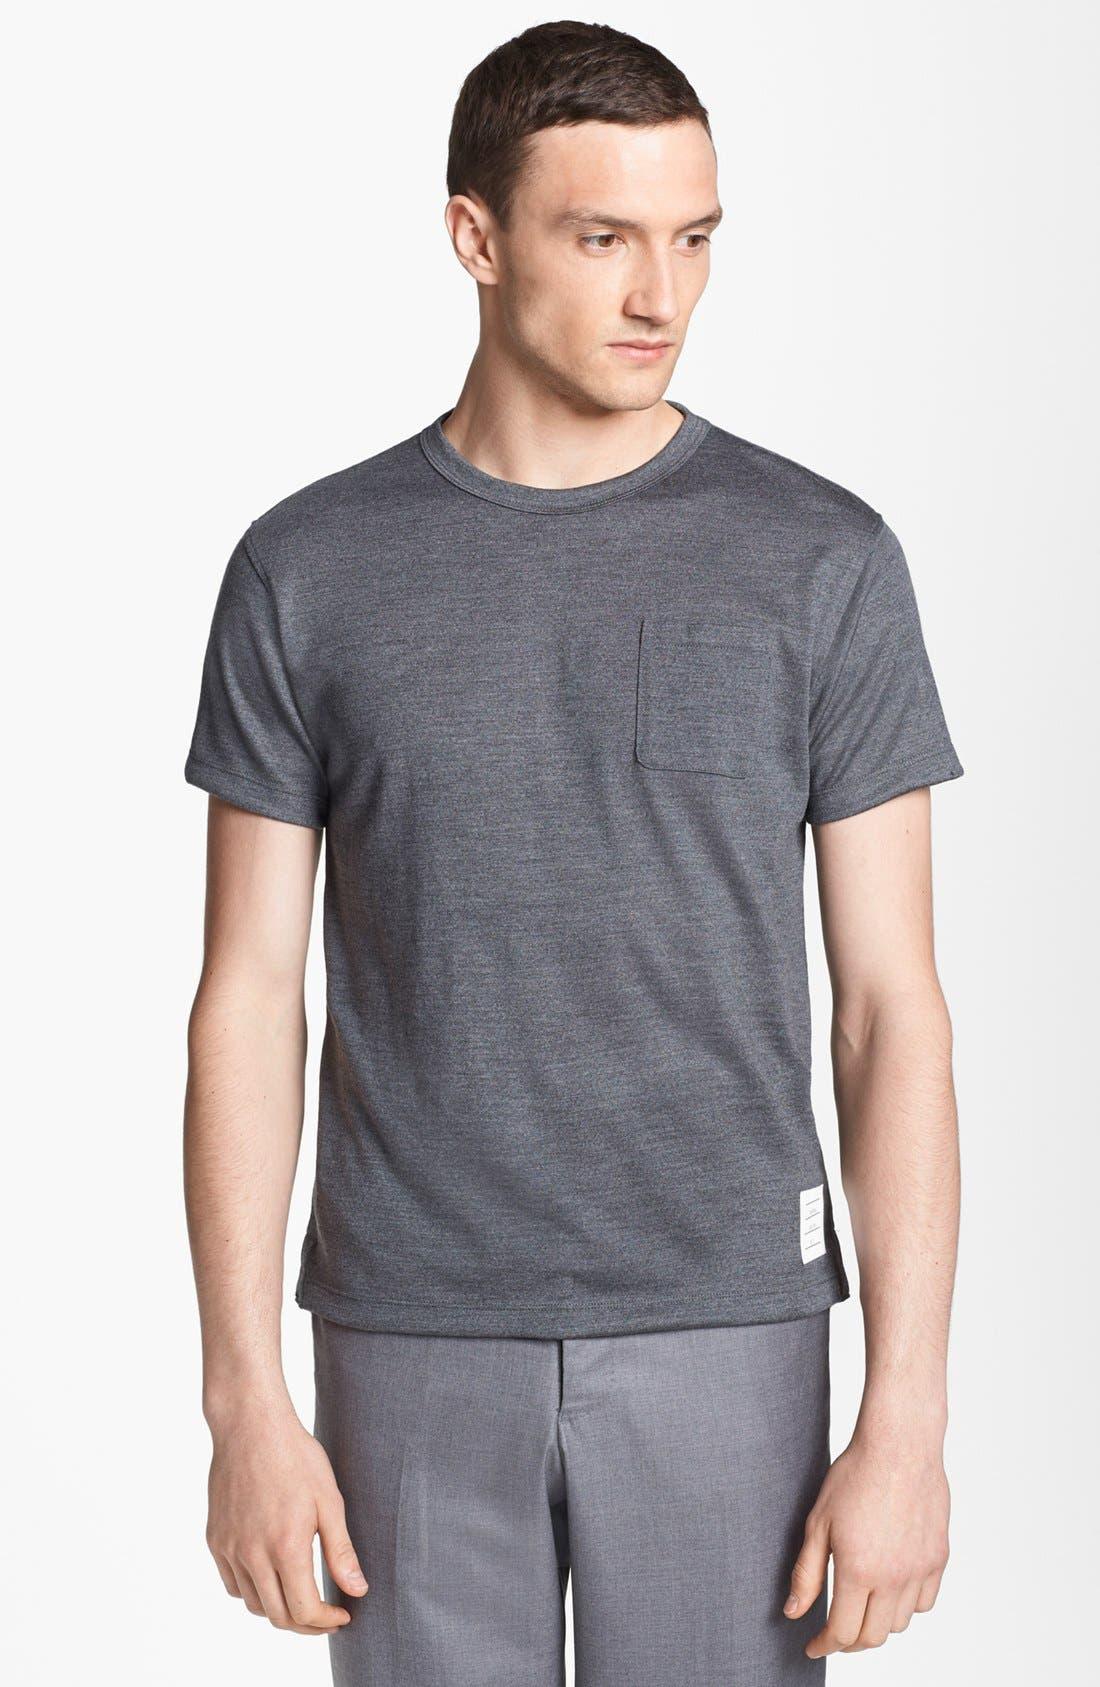 Alternate Image 1 Selected - Thom Browne Merino Wool Pocket T-Shirt